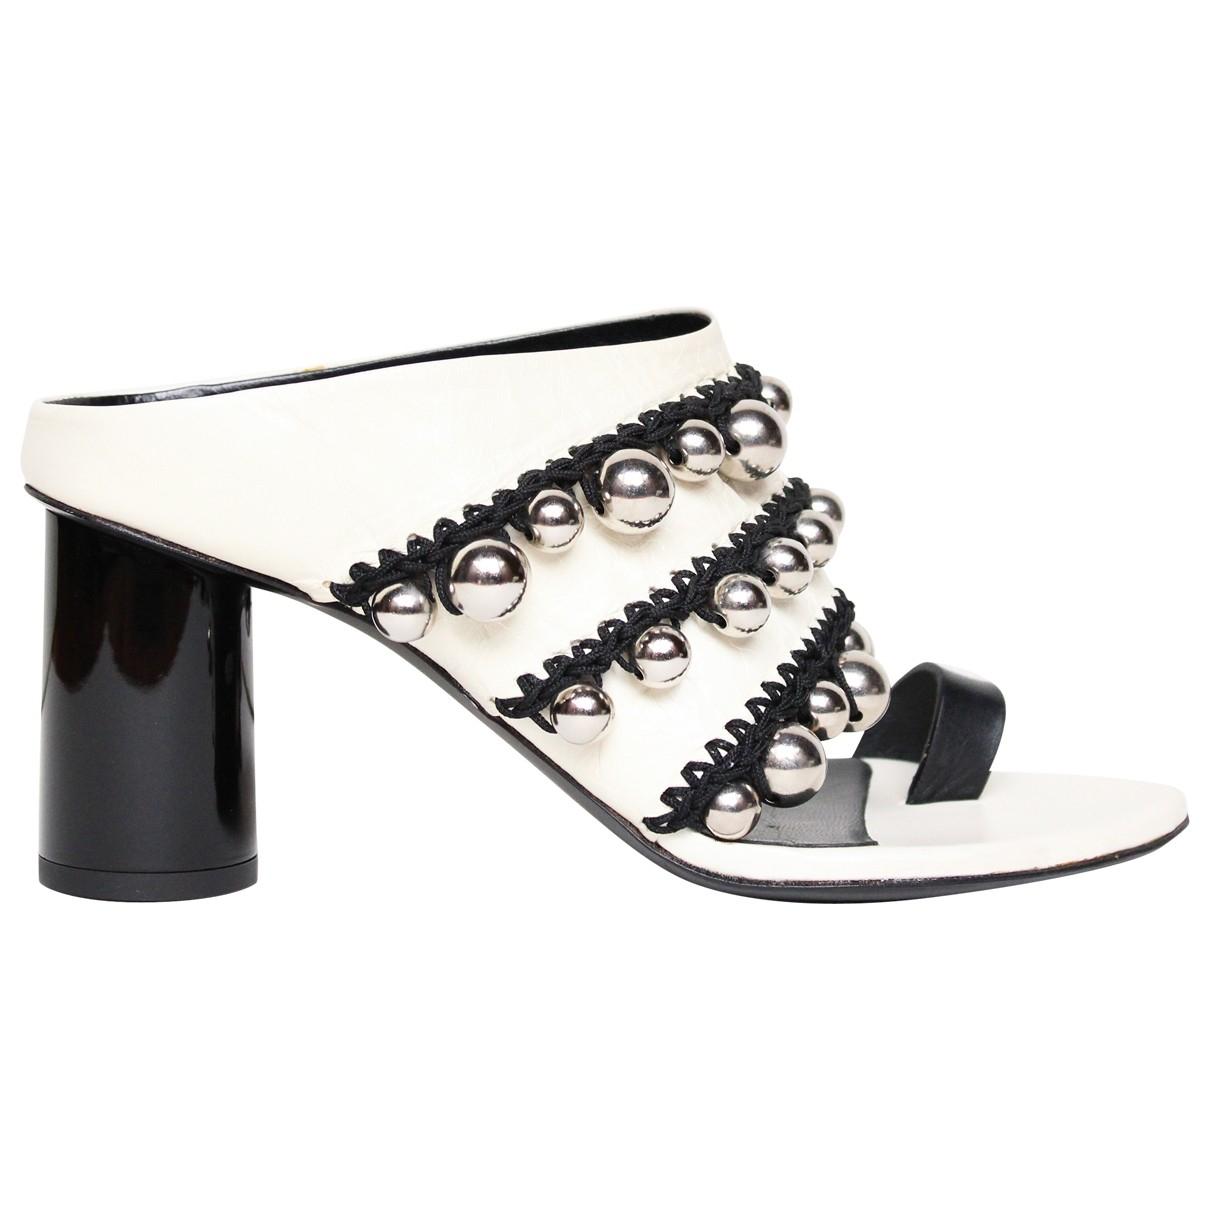 Proenza Schouler \N White Leather Sandals for Women 37 EU